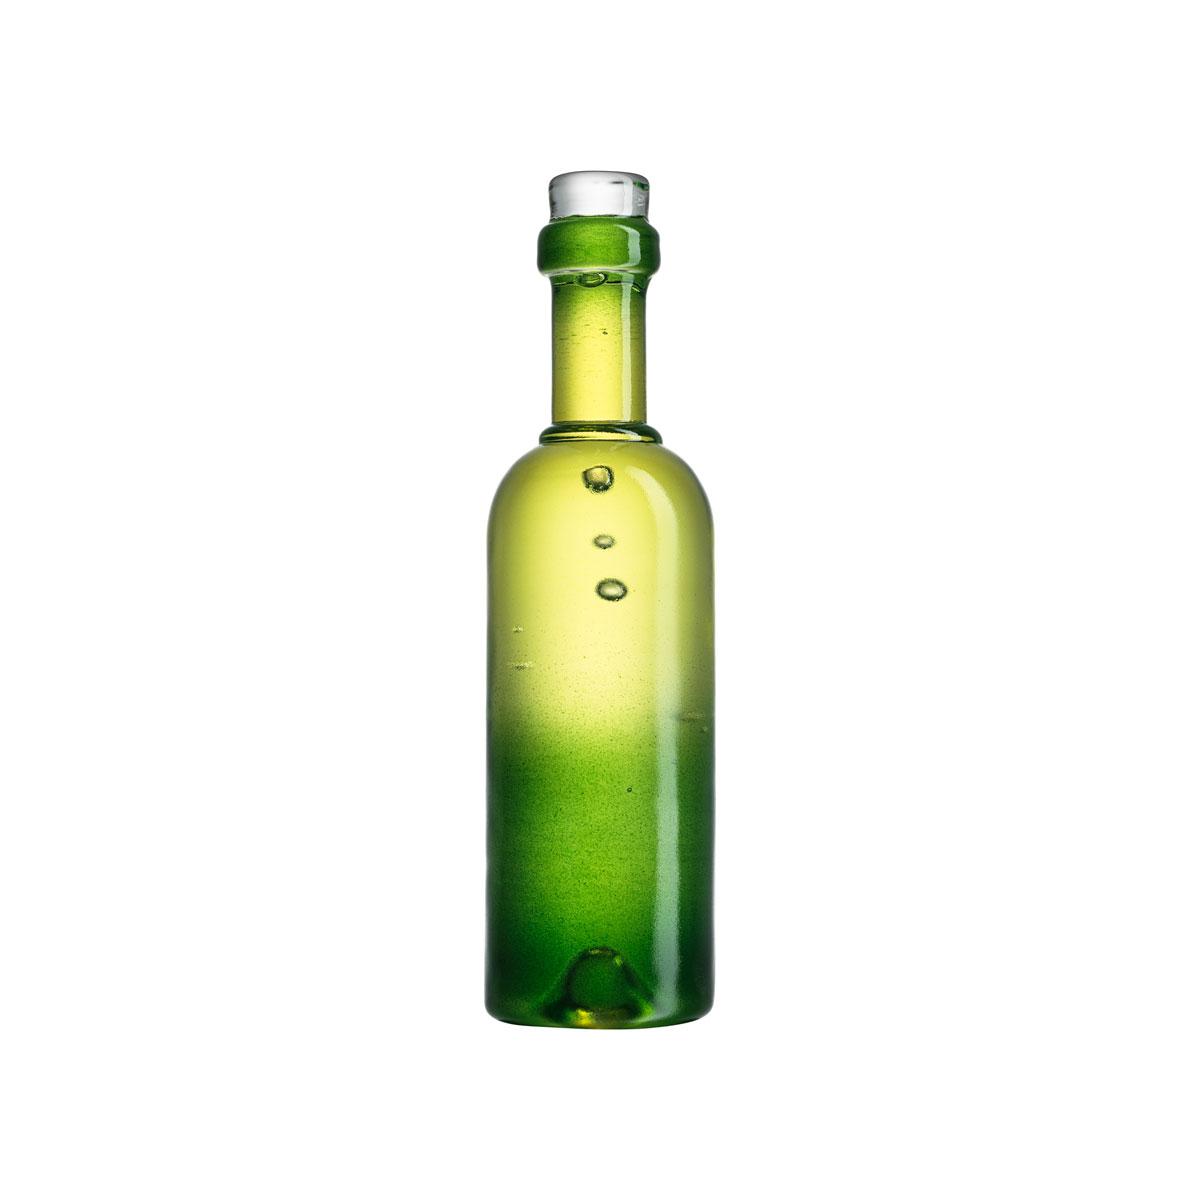 Kosta Boda Celebrate Crystal Wine Bottle, Green